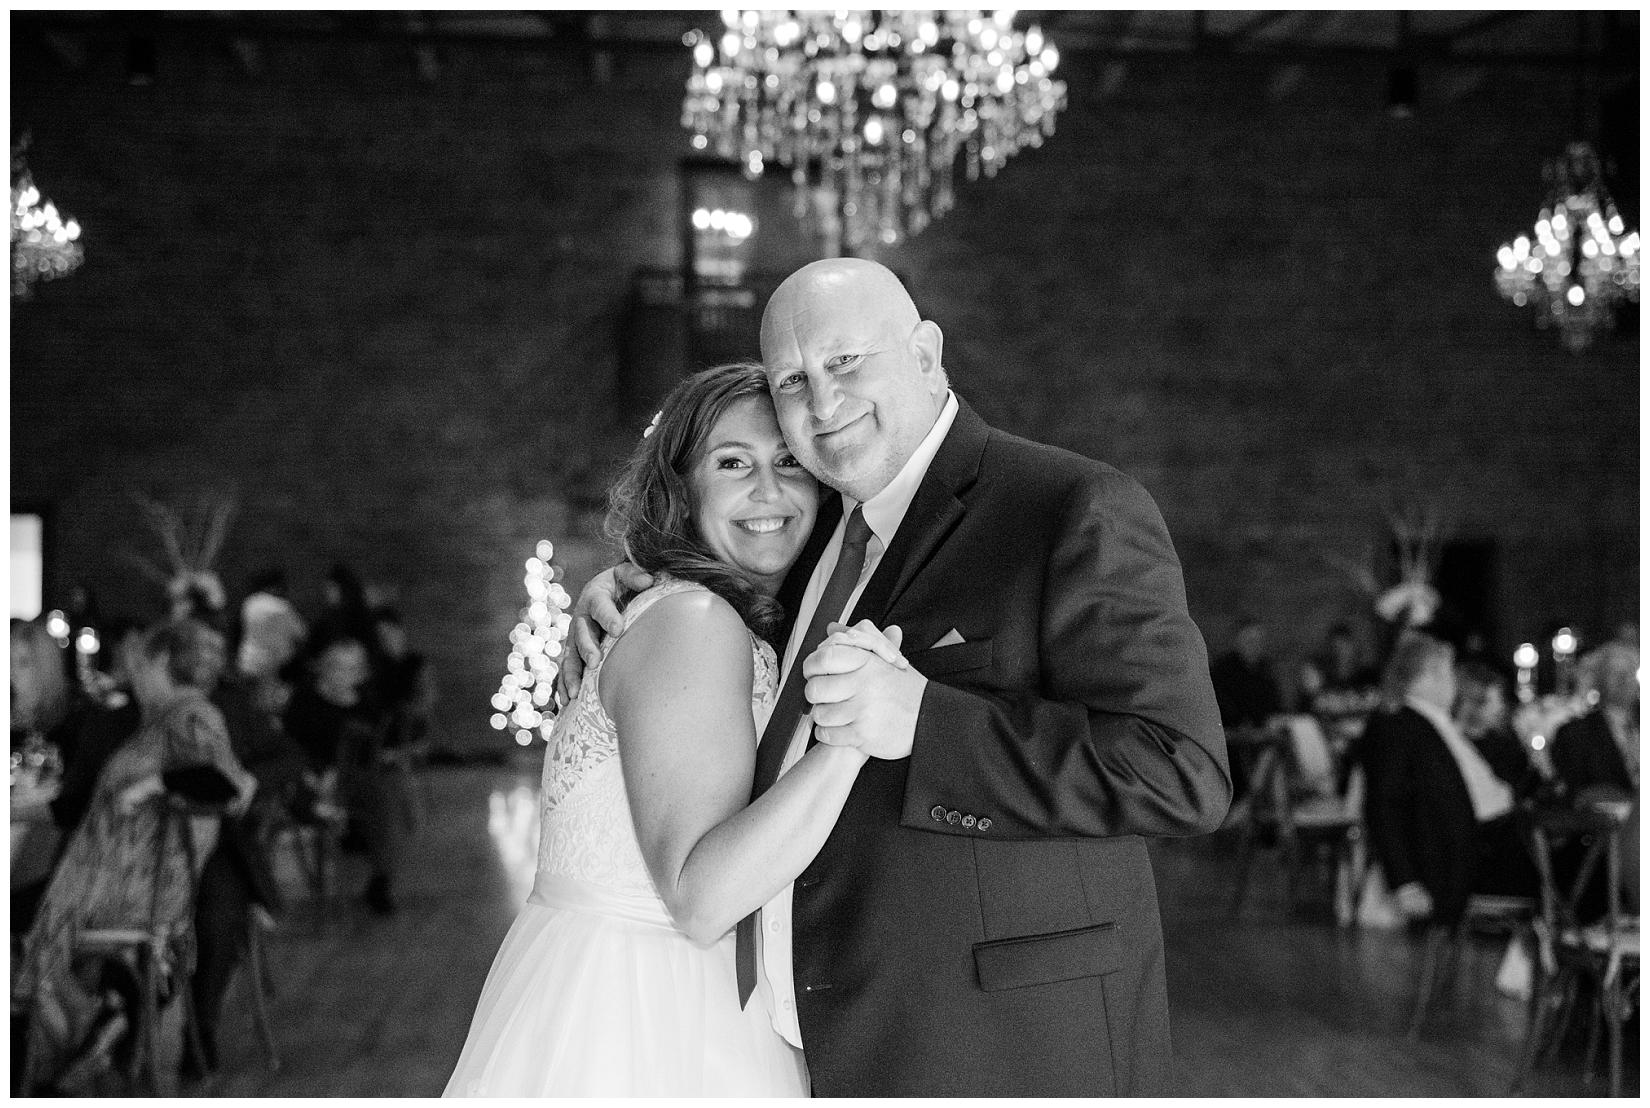 cat-alkire-wedding-photographer-indiana-chicago-indianapolis-fort-wayne_1005.jpg